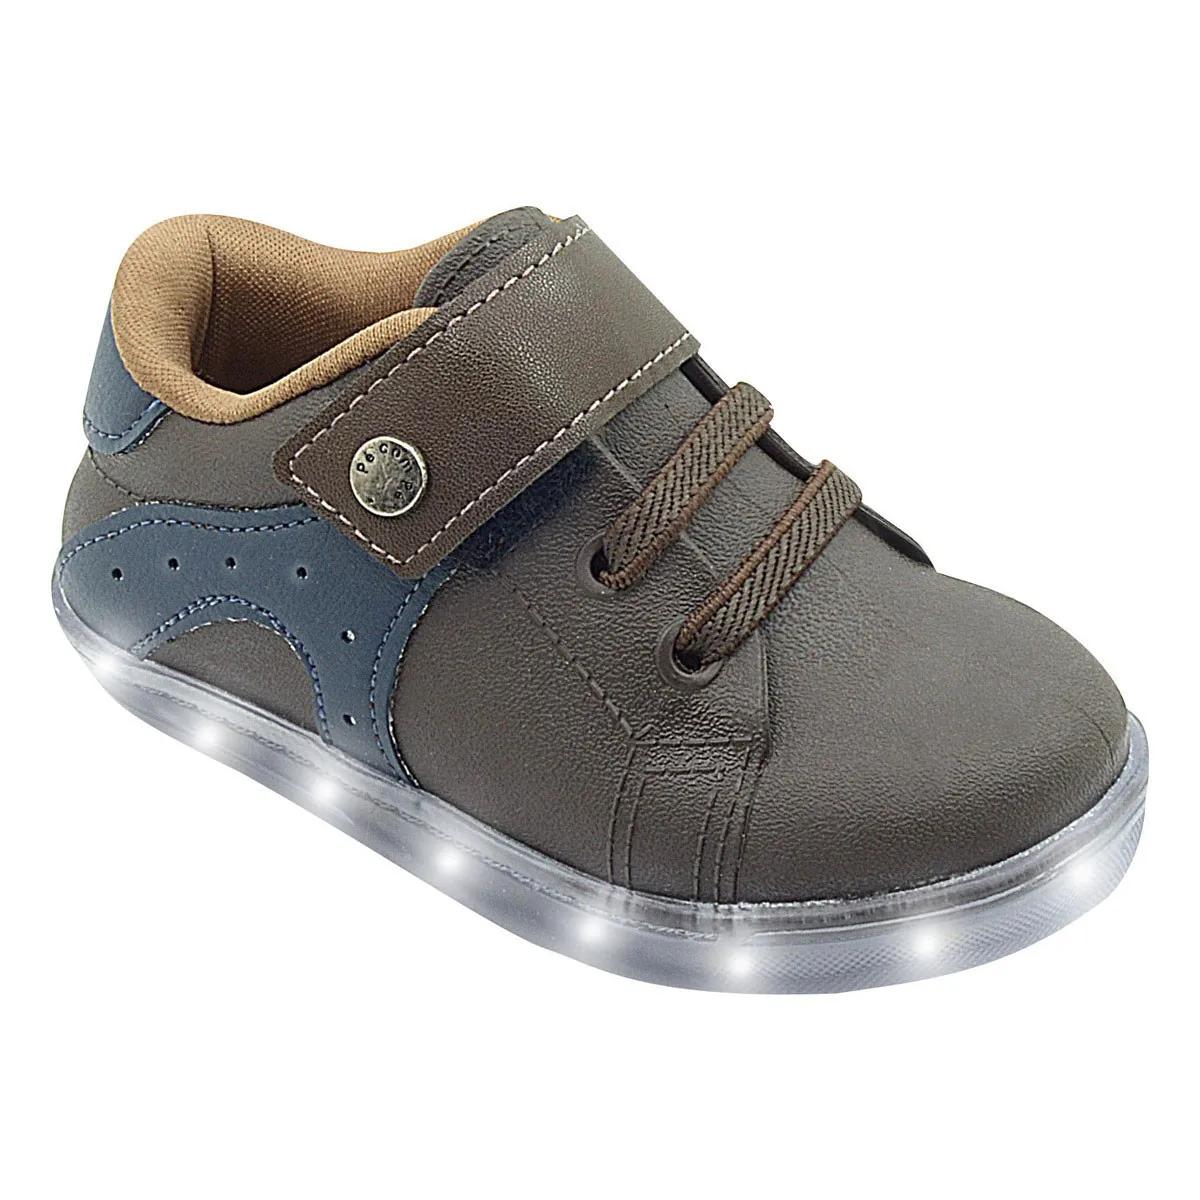 Tênis Infantil Sneaker com Led Marrom Menino